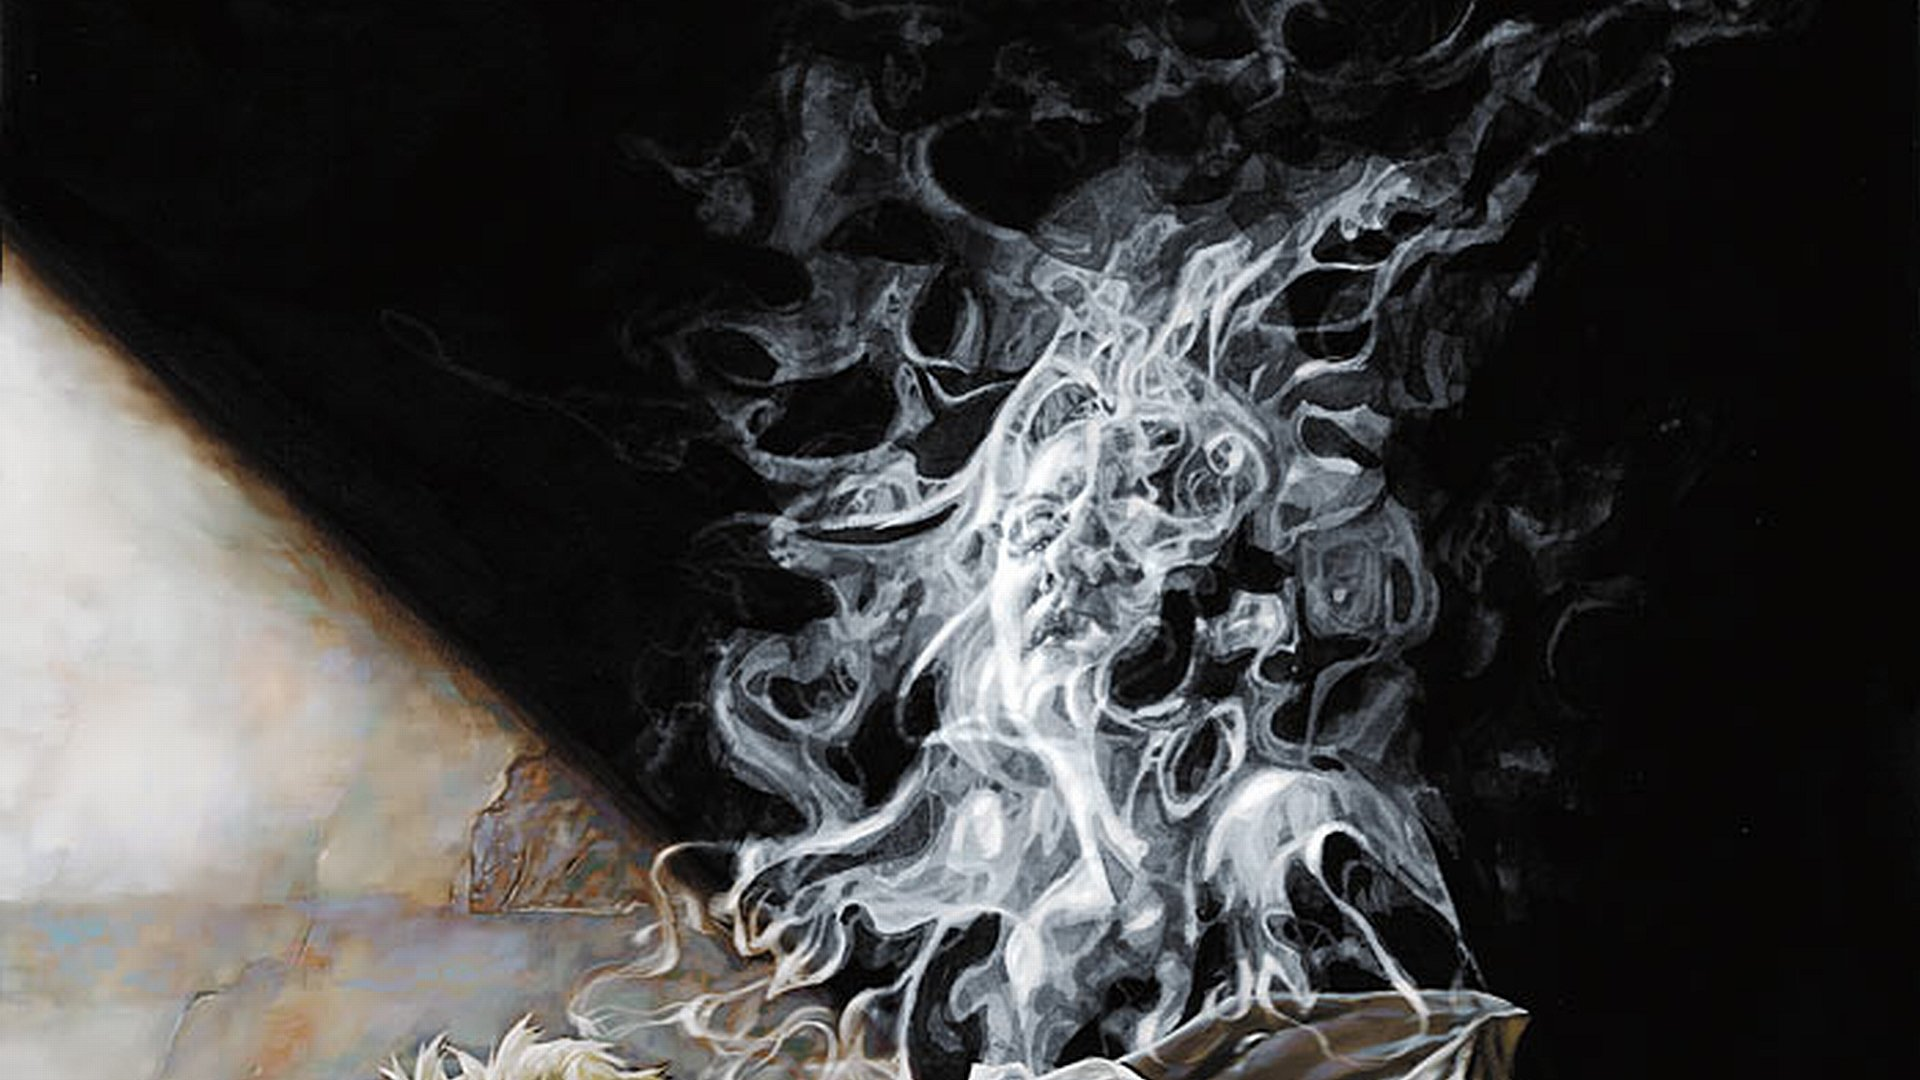 Best John Constantine Hellblazer Wallpaper Id384984 For